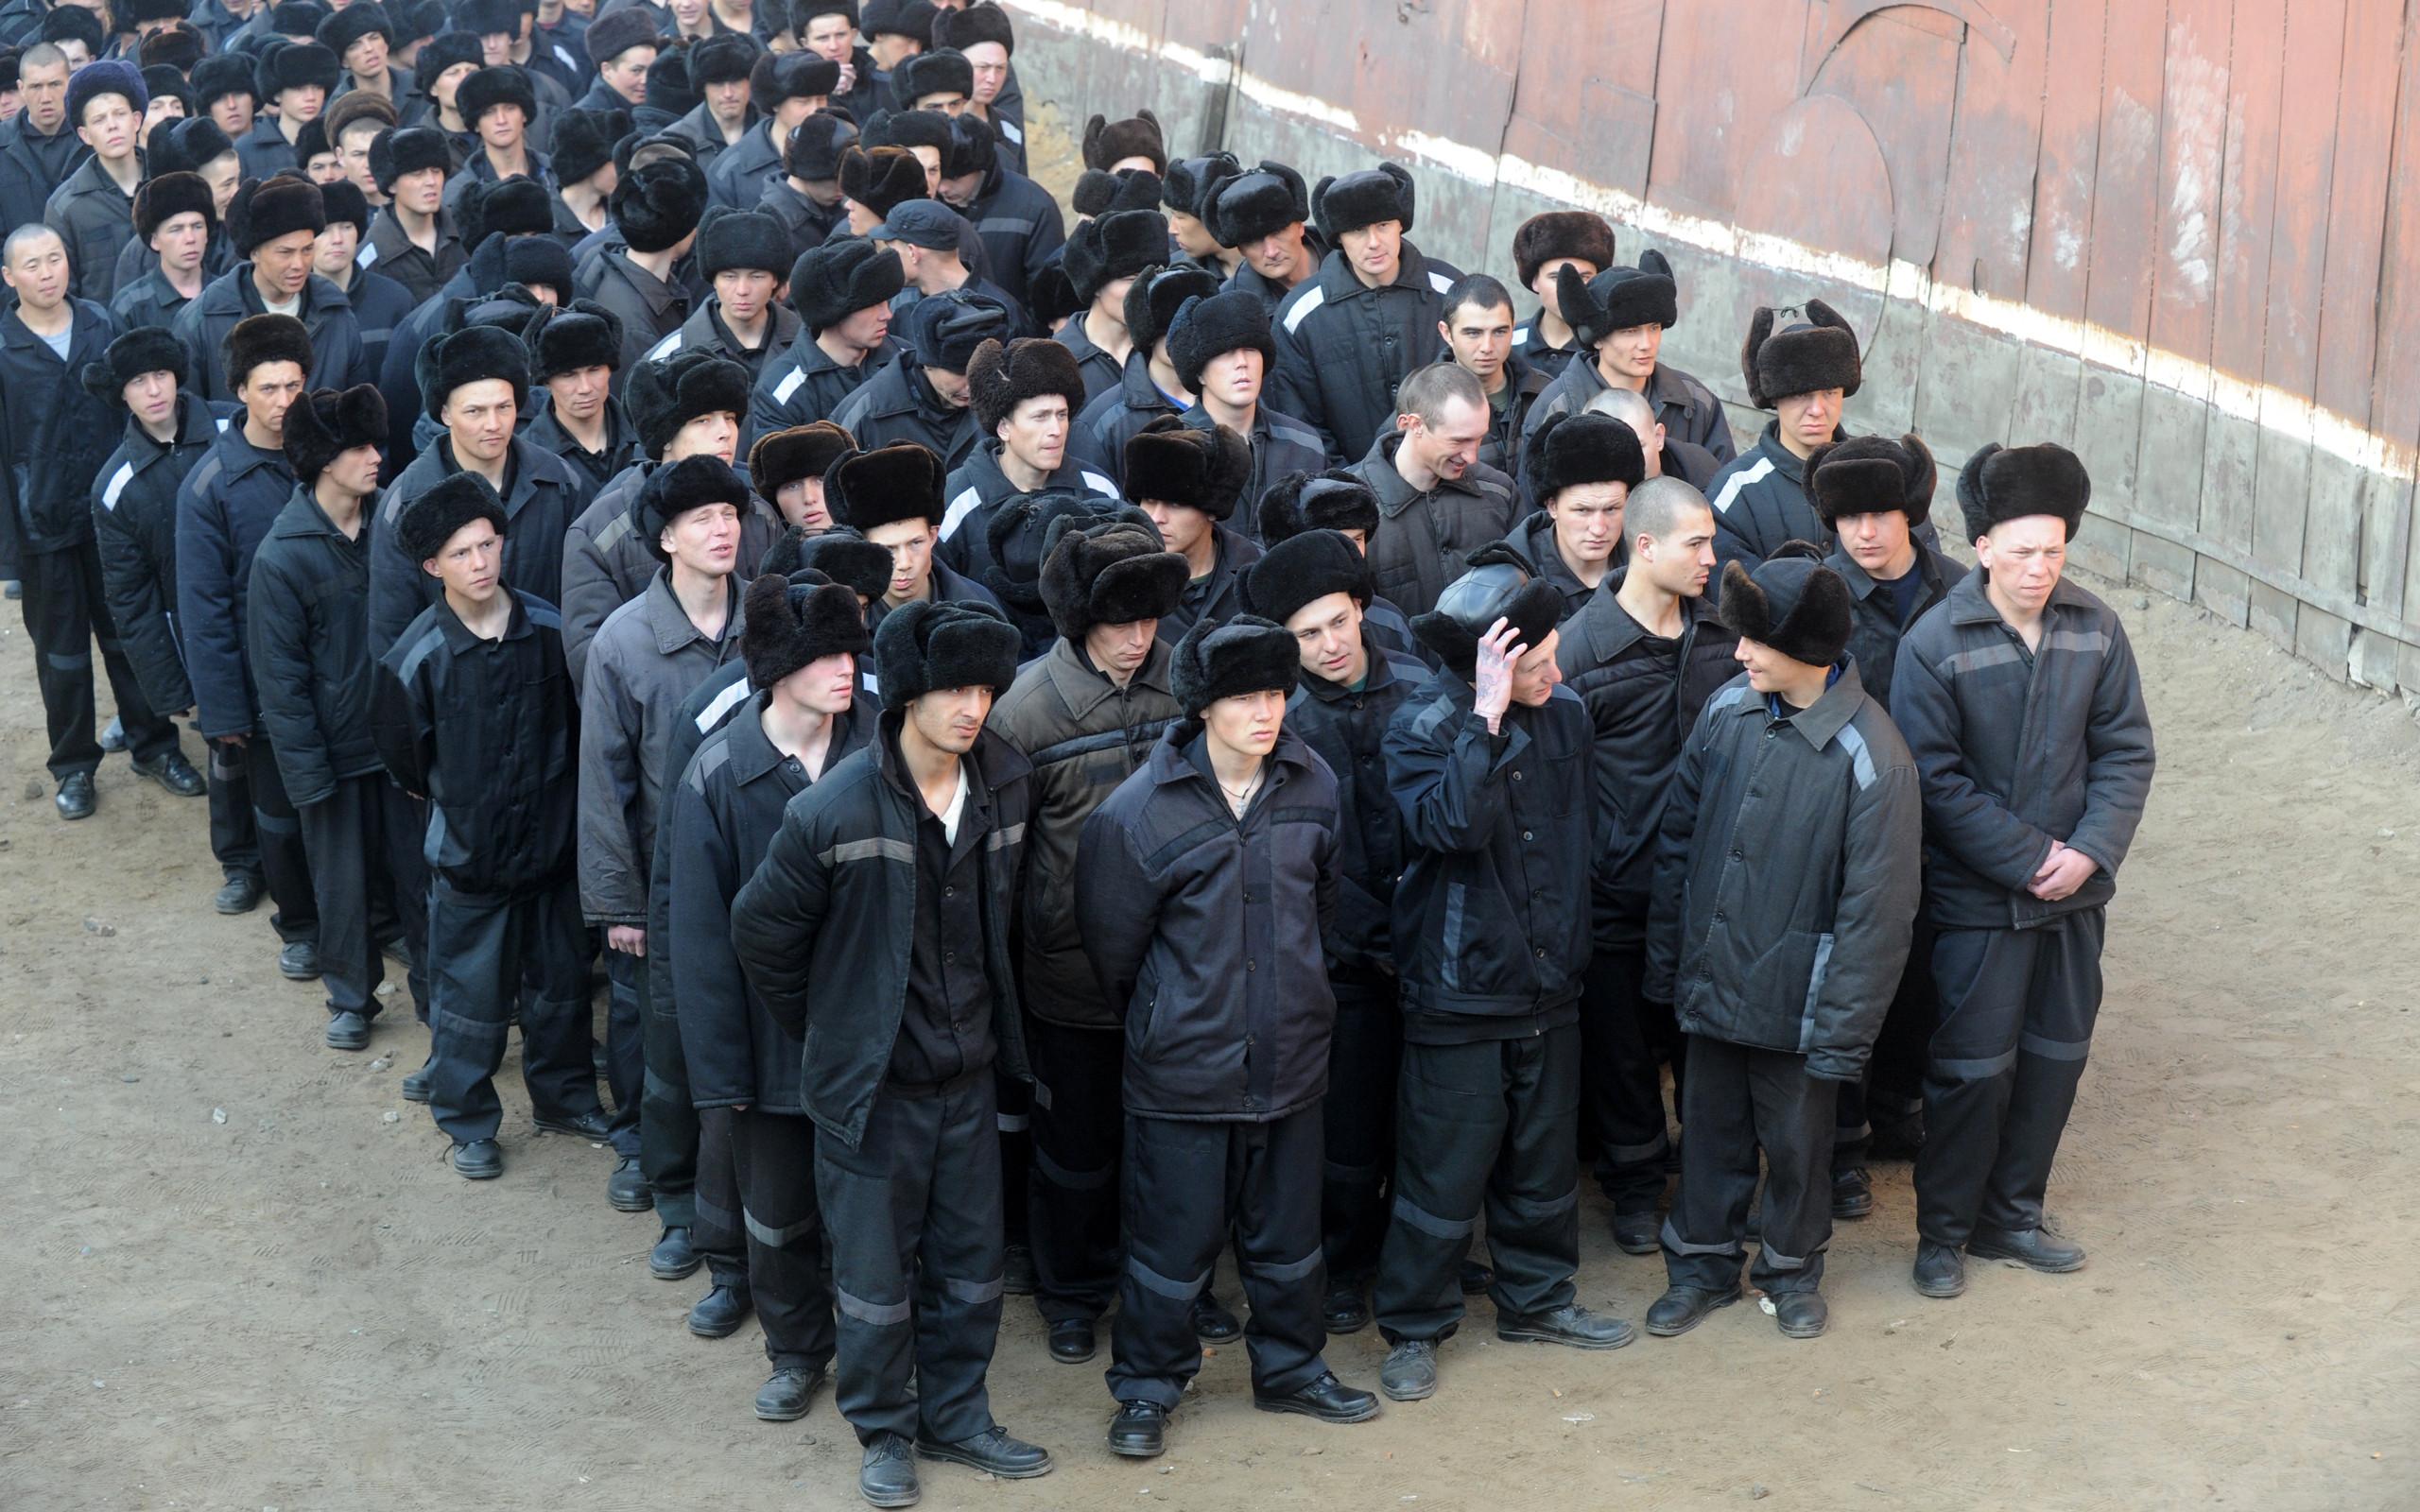 <p>Фото: &copy; РИА Новости/<span>Денис Гуков</span></p>